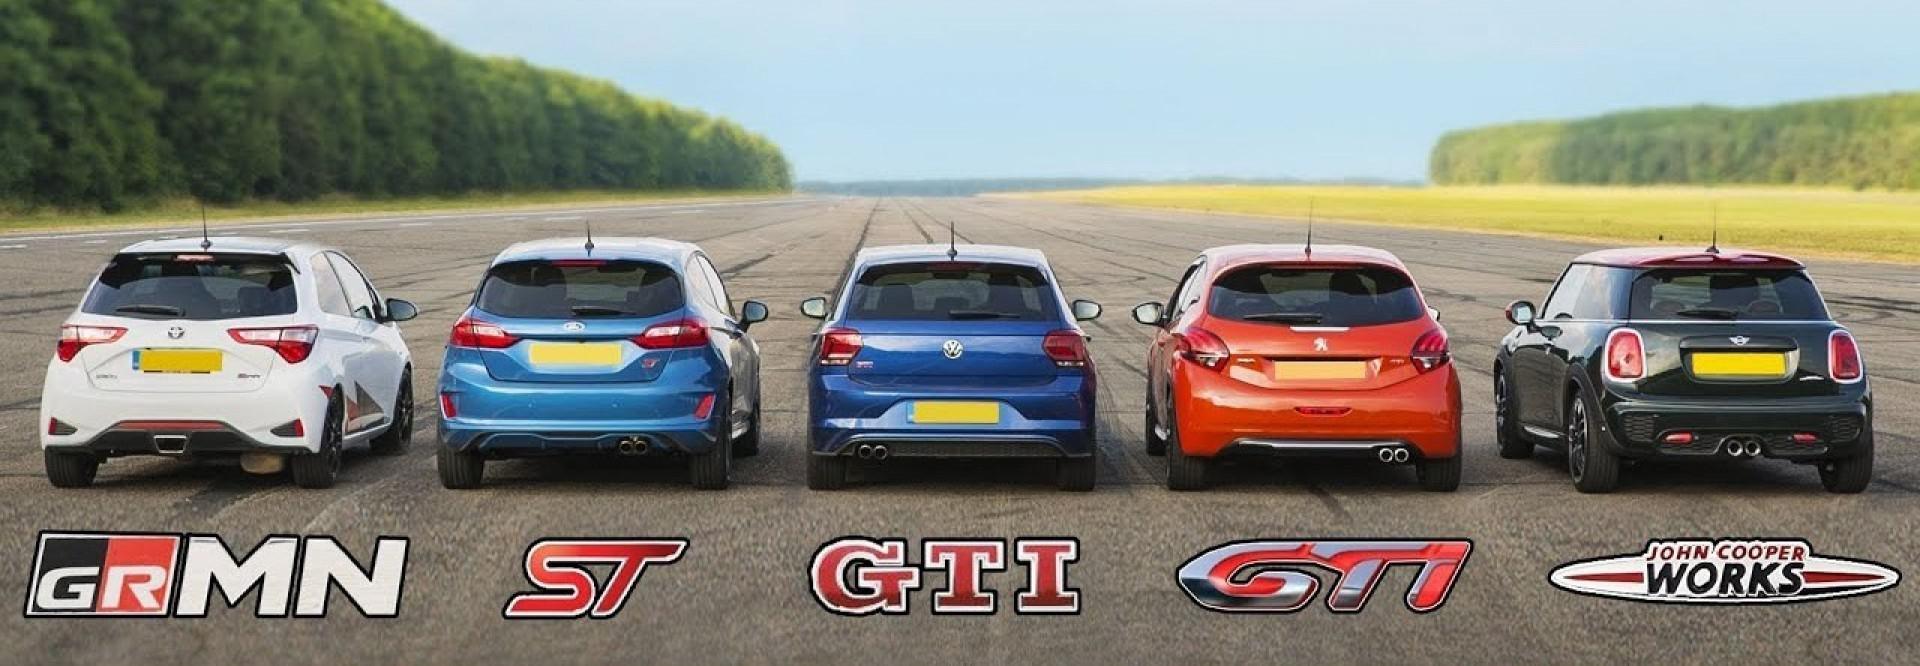 Quelle sportive se classera en première position ? Polo GTI vs Fiesta ST vs Mini JCW vs Yaris GRMN vs 208 GTi